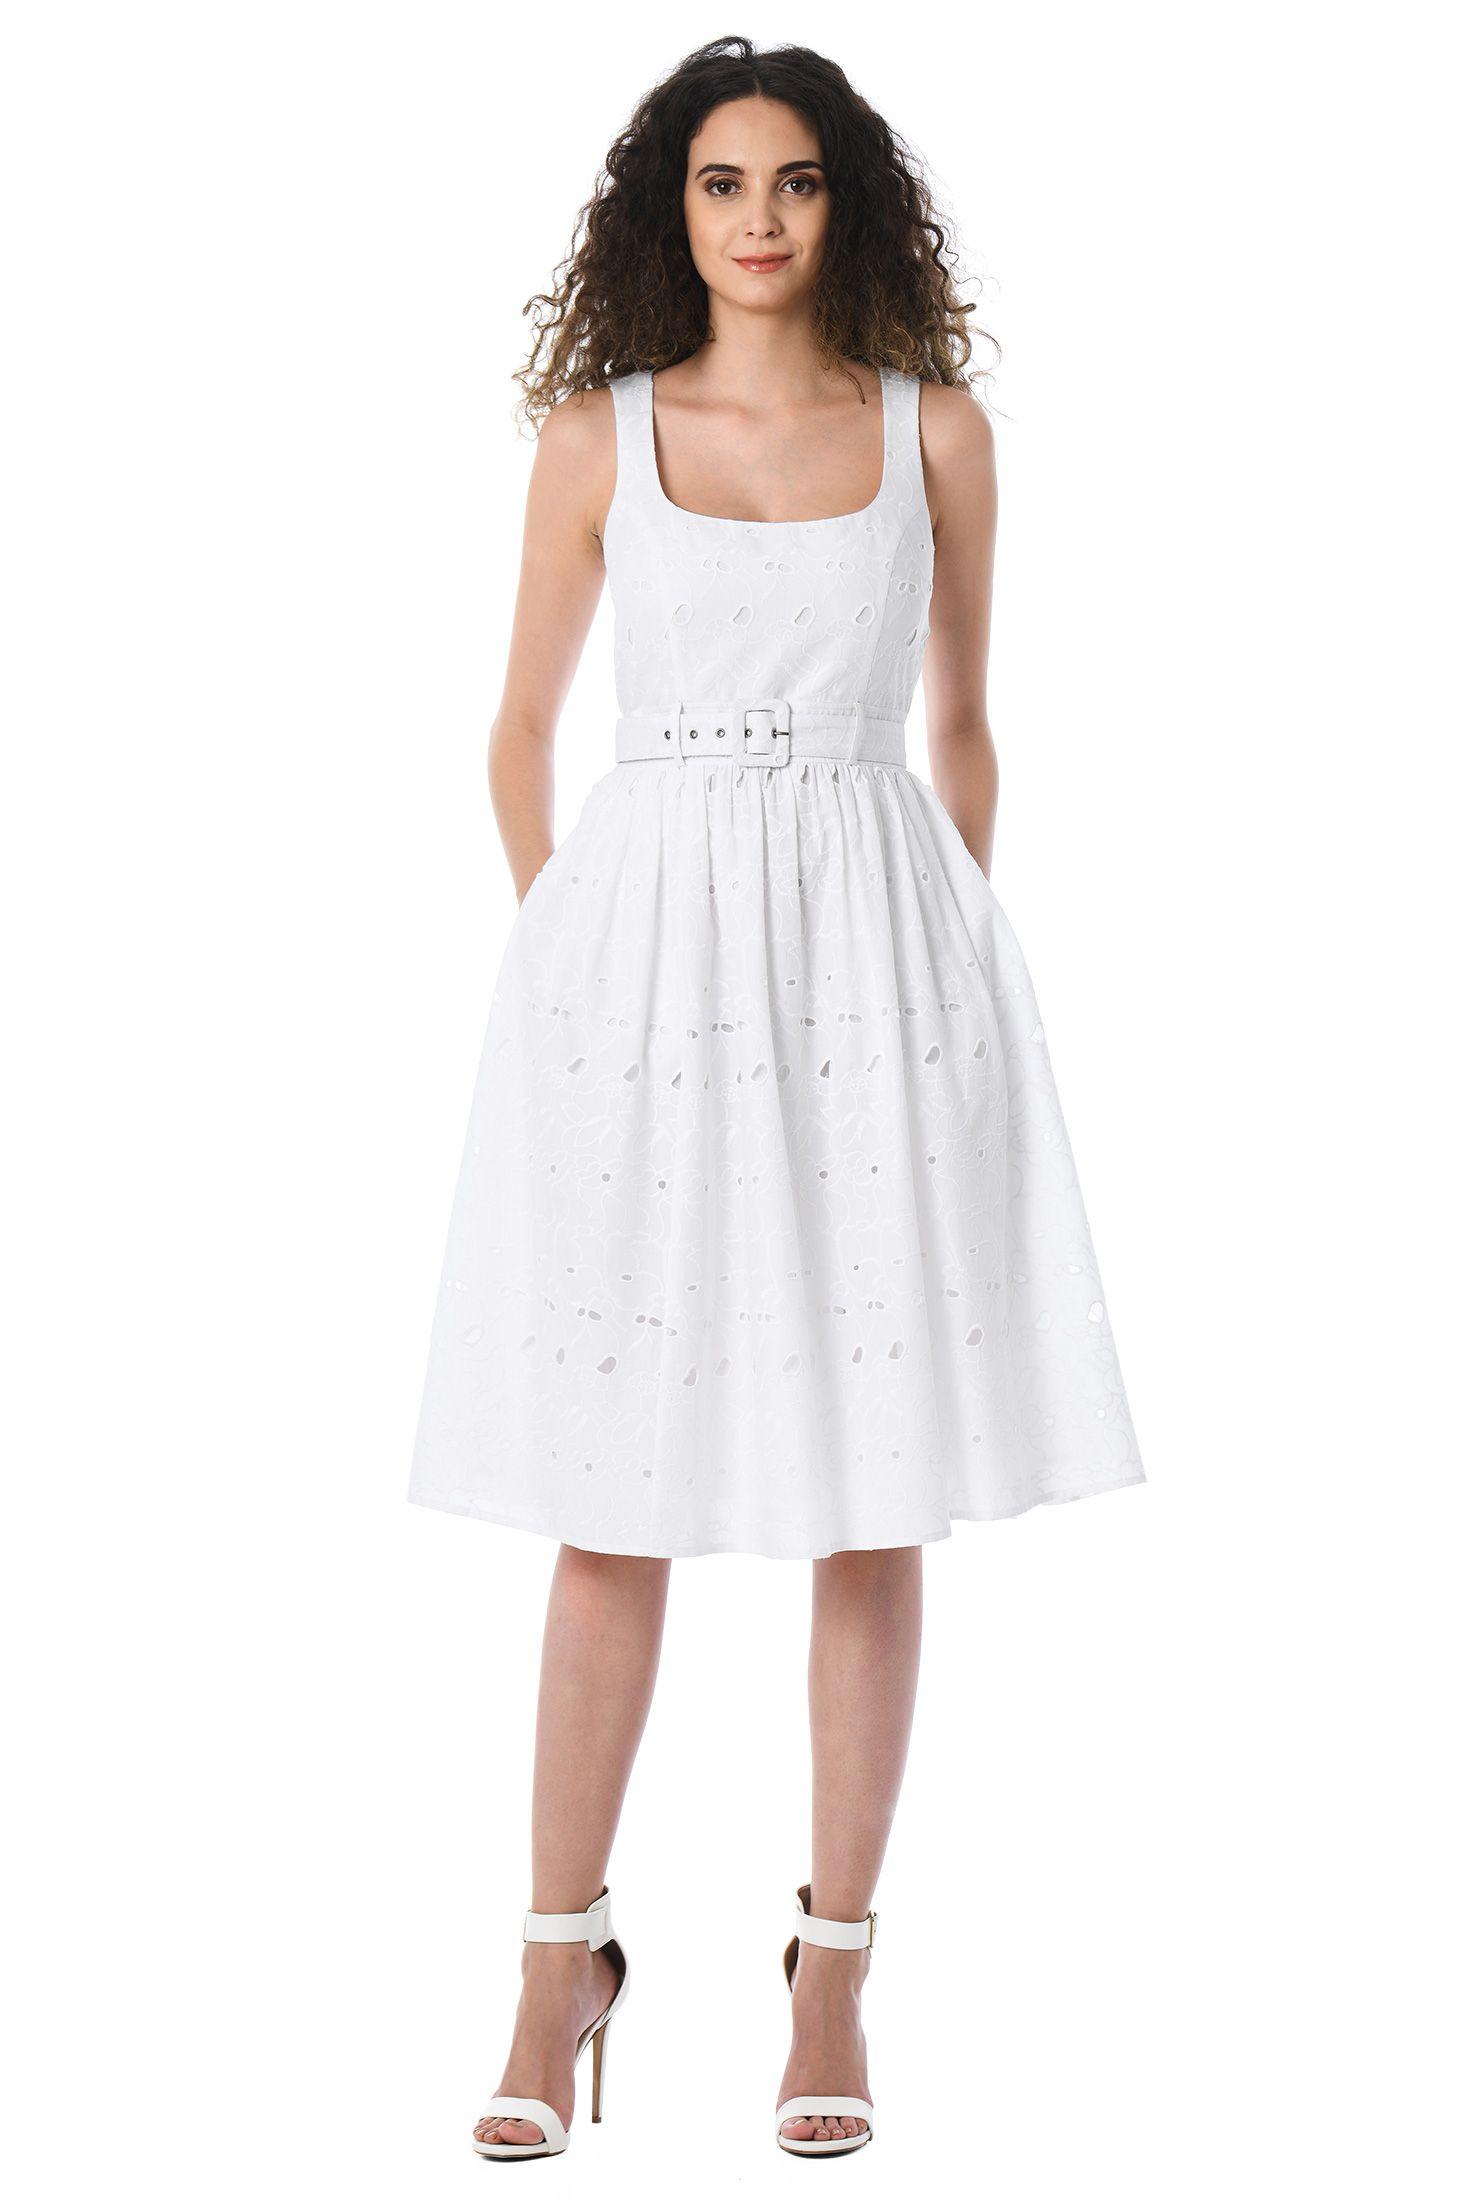 Design your own wedding dress cheap  Custom design this dress Choose your own neckline sleeve dress